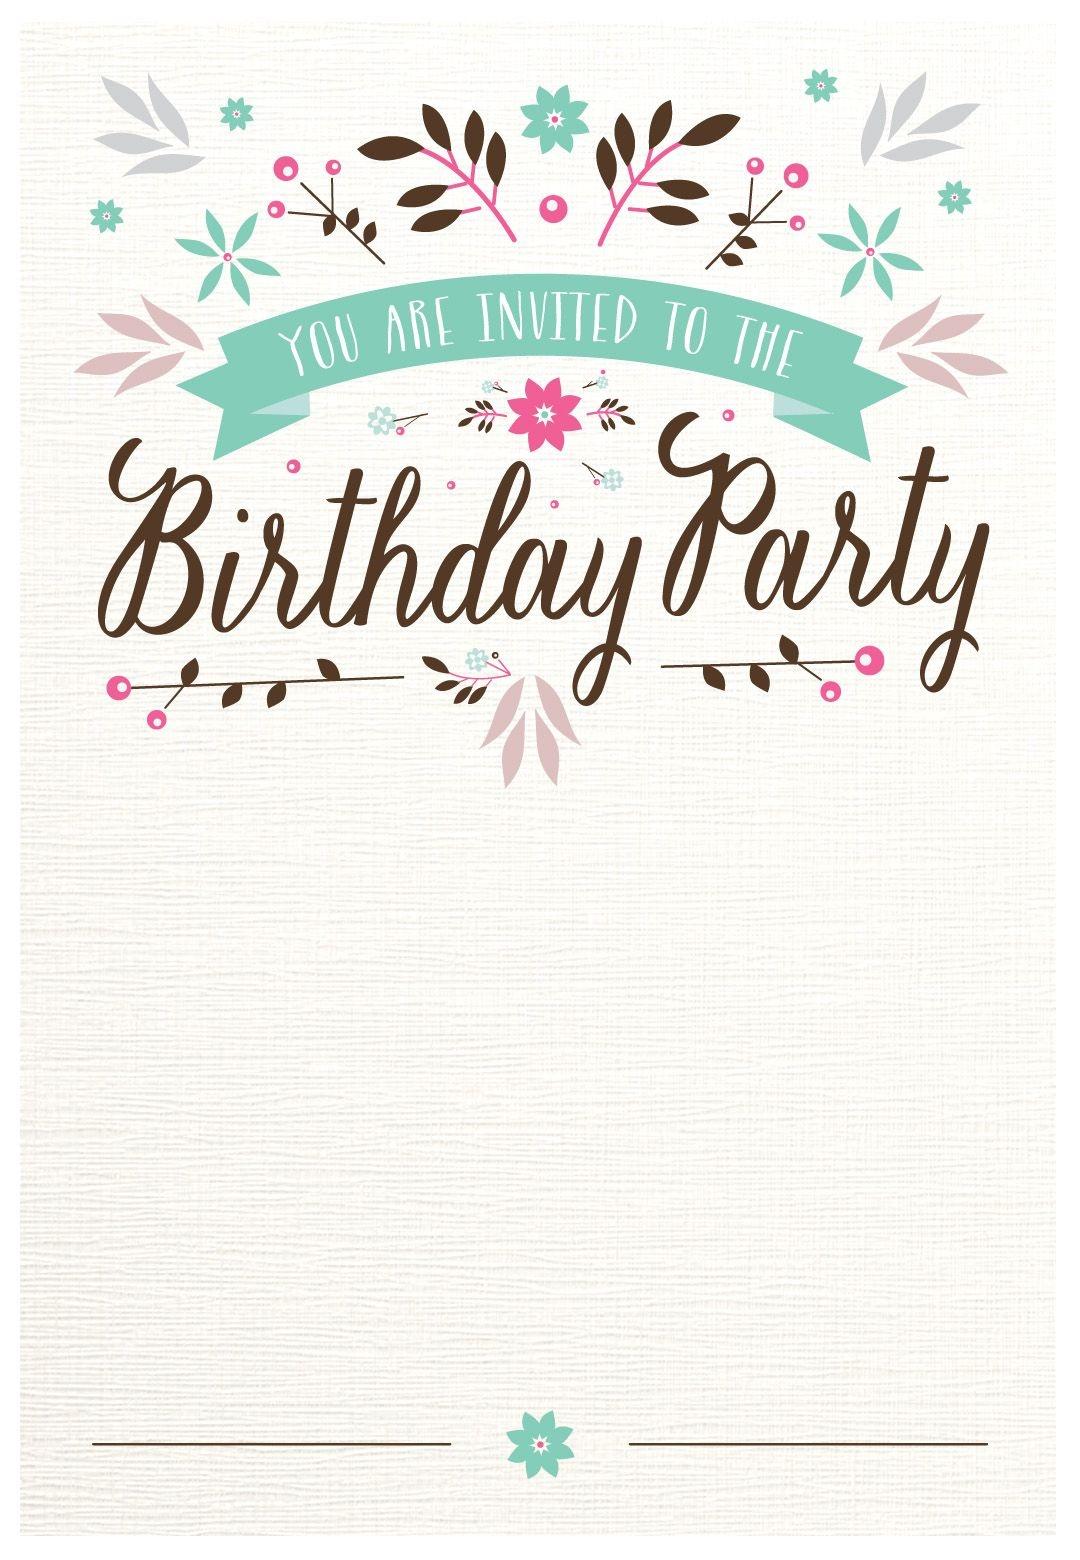 Flat Floral - Free Printable Birthday Invitation Template - Free Printable Birthday Invitation Cards Templates